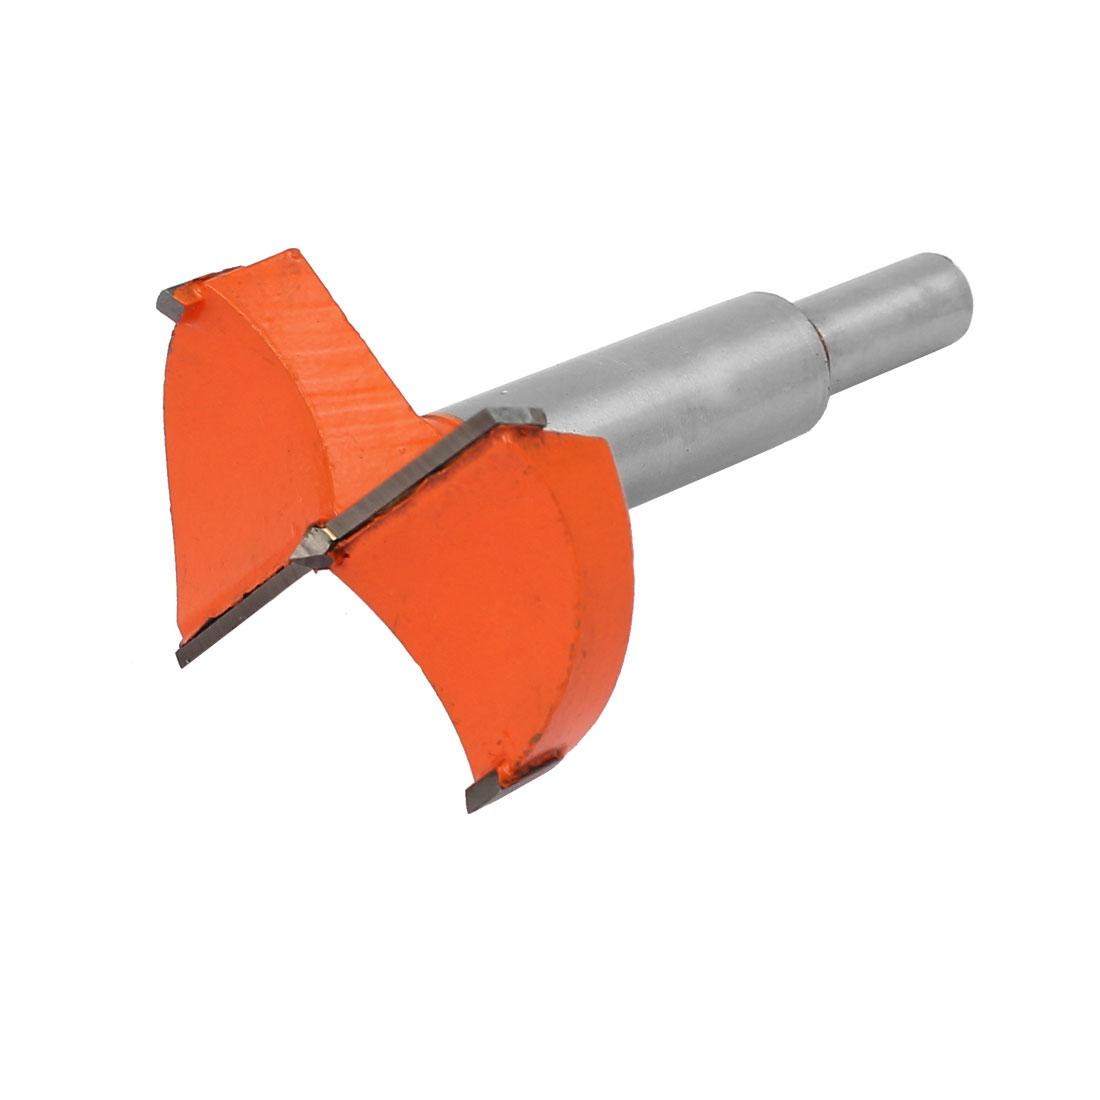 53mm Dia Carbide Tip Wood Drilling Cutting Hinge Boring Bit Drill Tool Orange